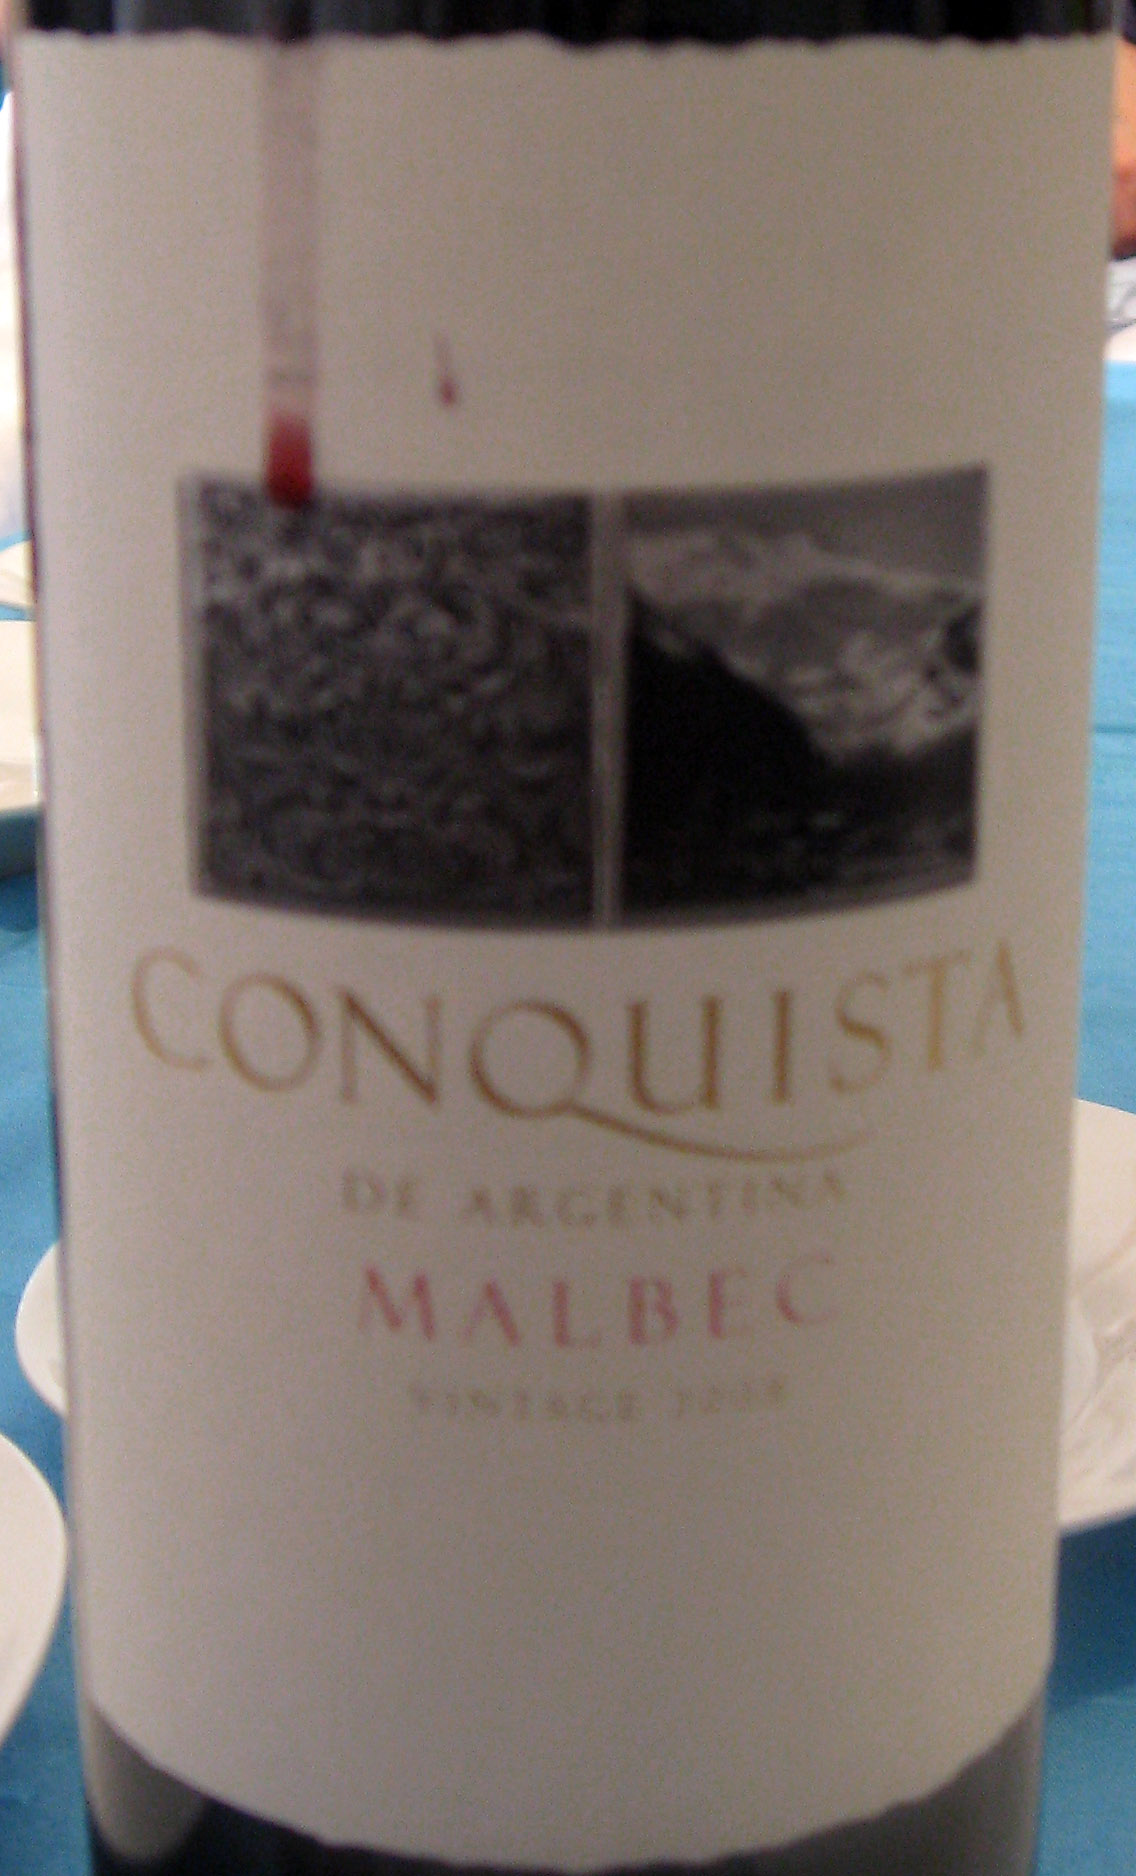 Conquista Malbec ( Bodega K70730 ) 2008